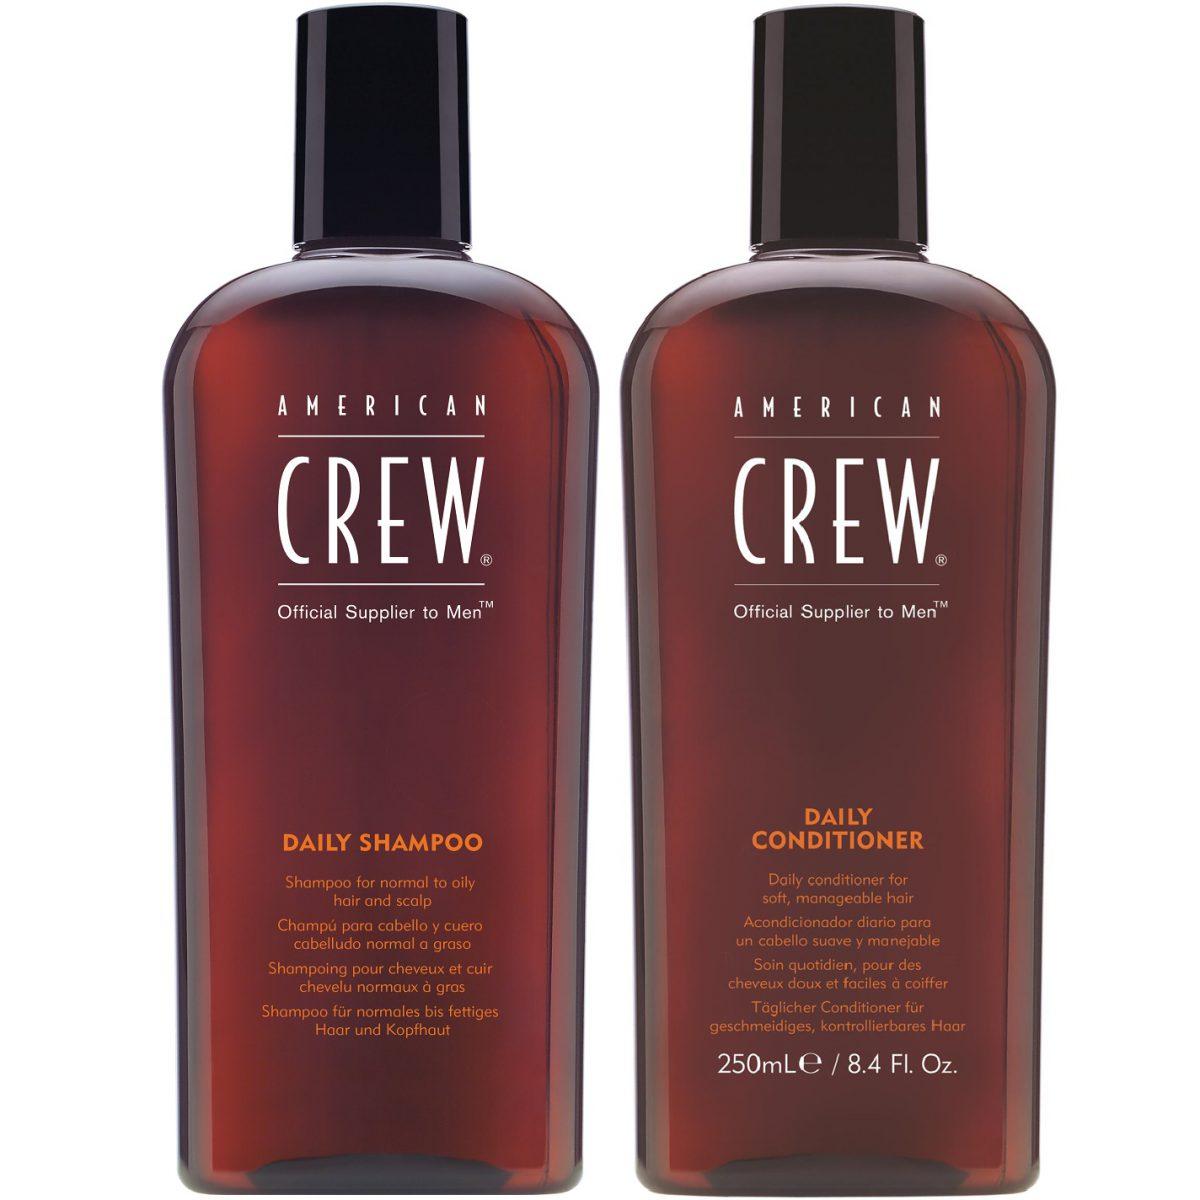 19_Emphase_American_Crew_Daily_Shampoo_250ml_Conditioner_250ml.jpg